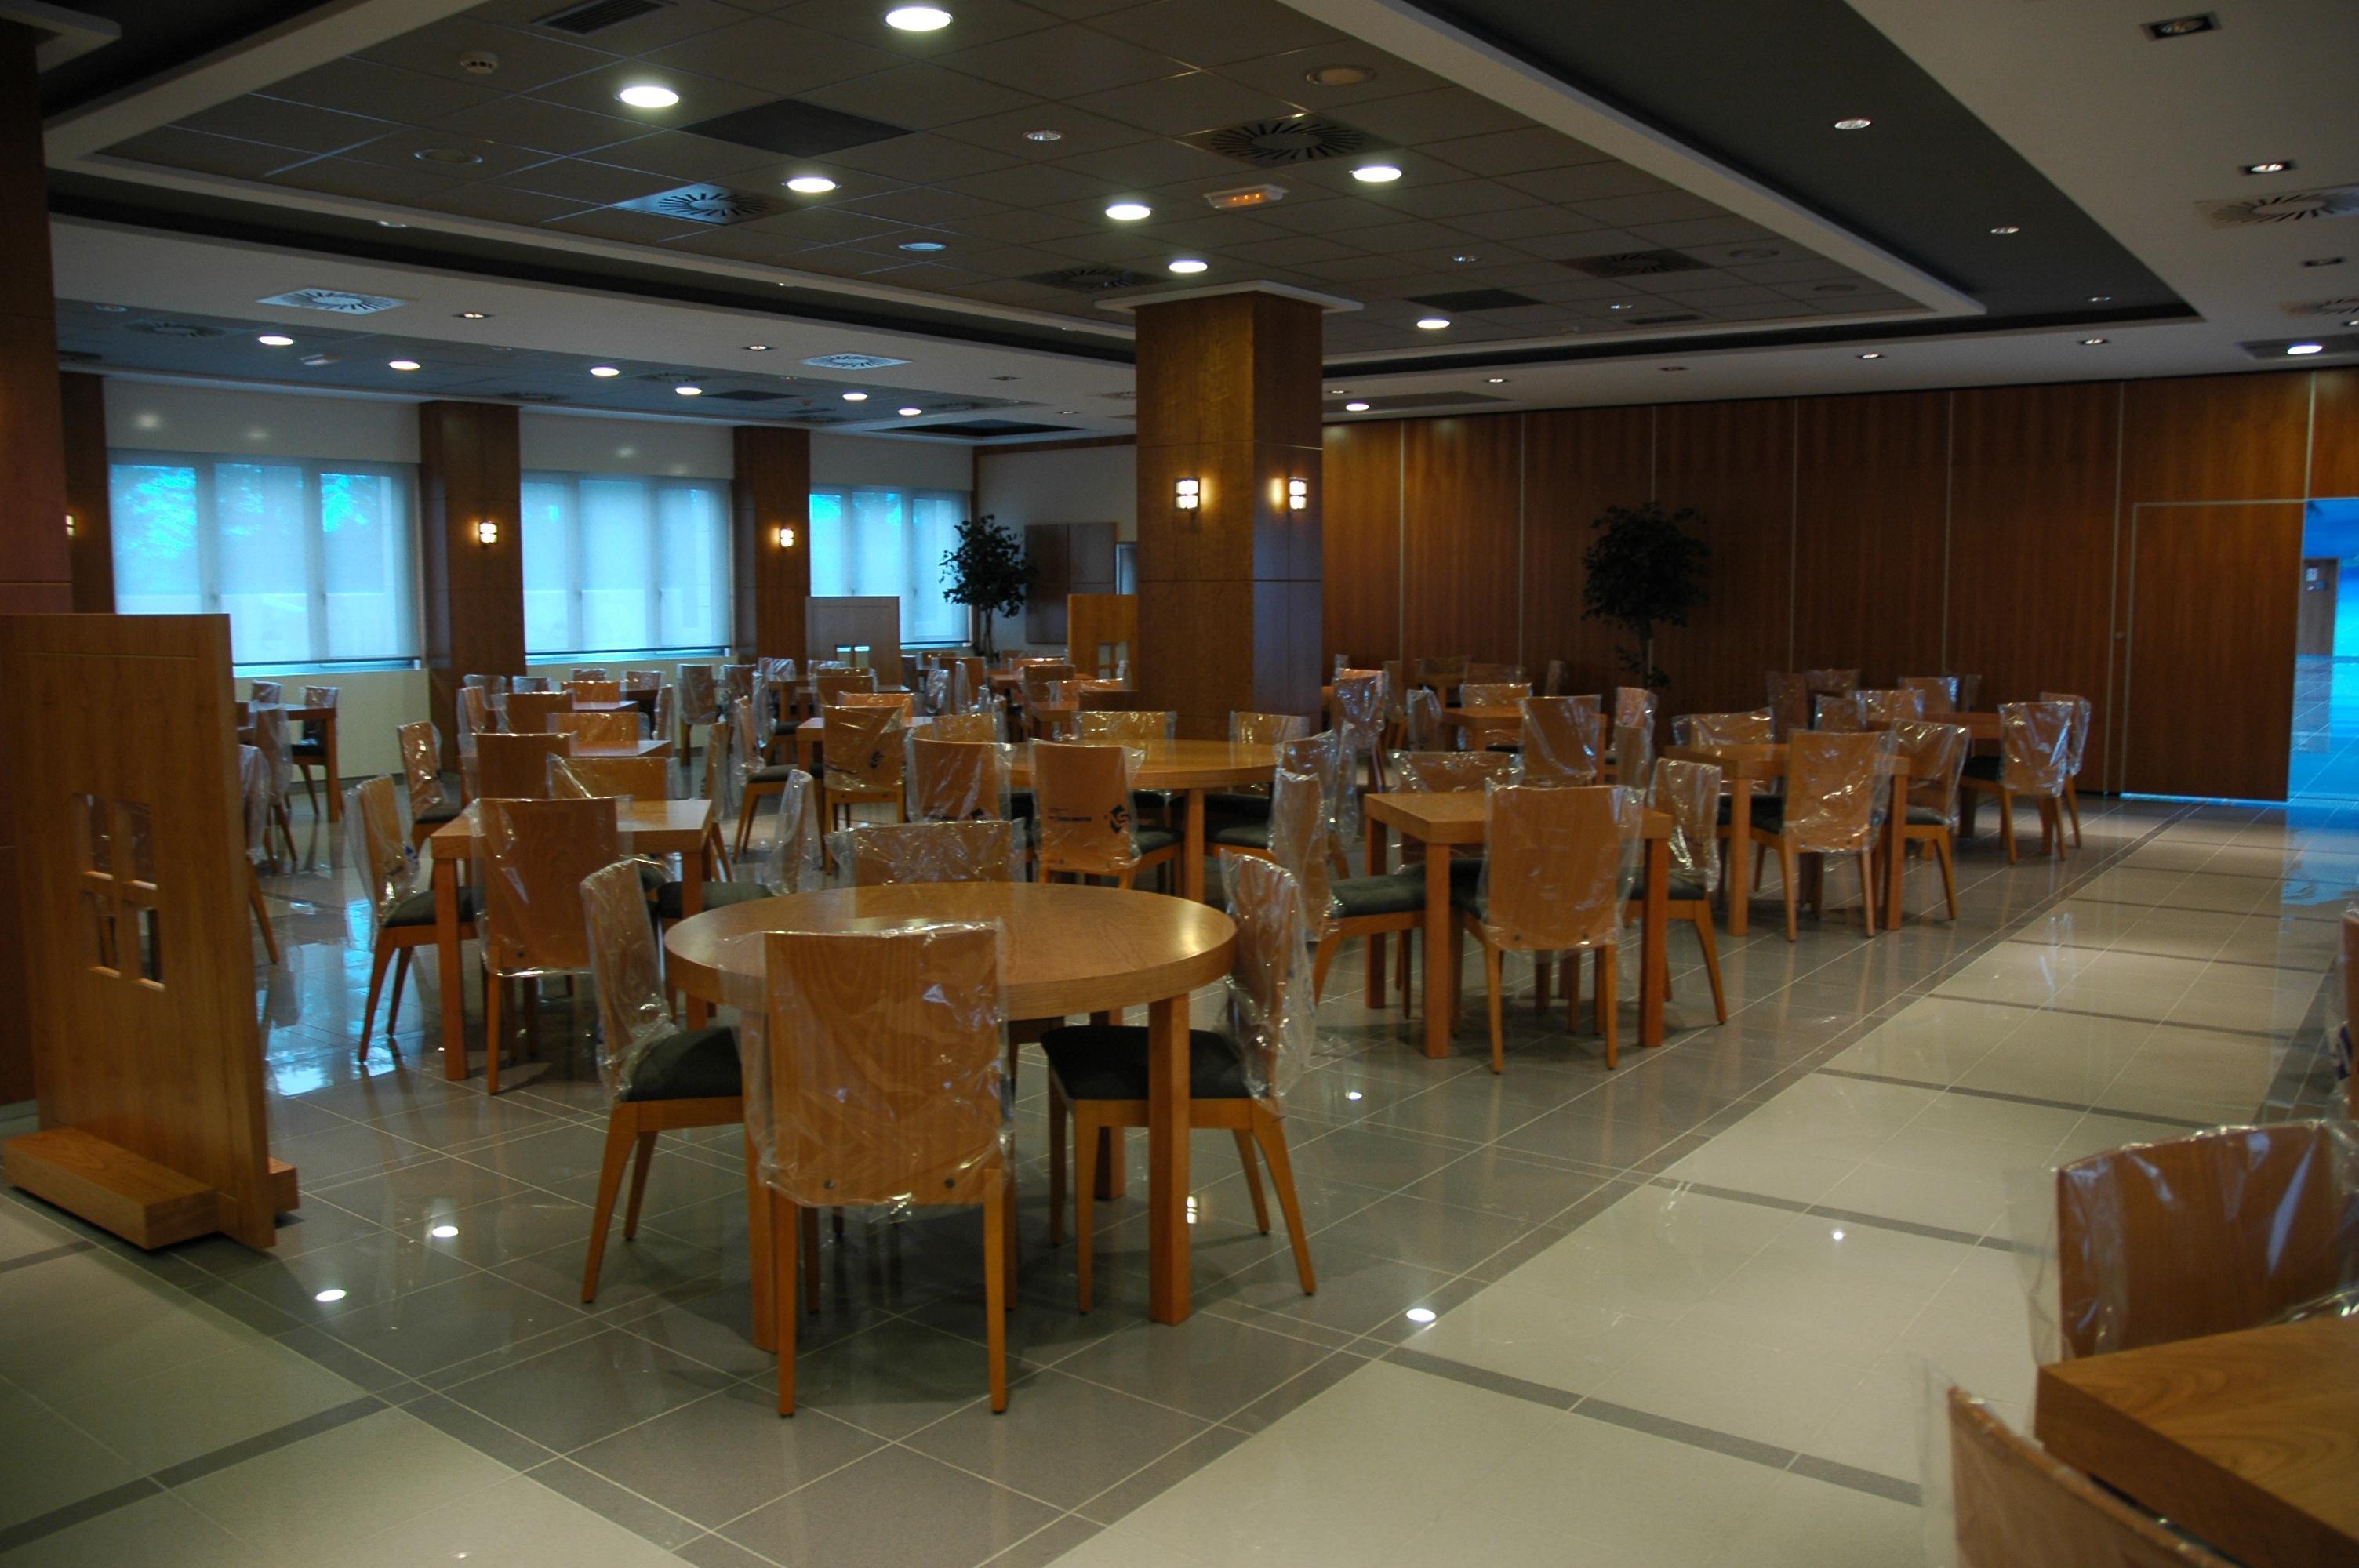 Hotel Velilla. 2003